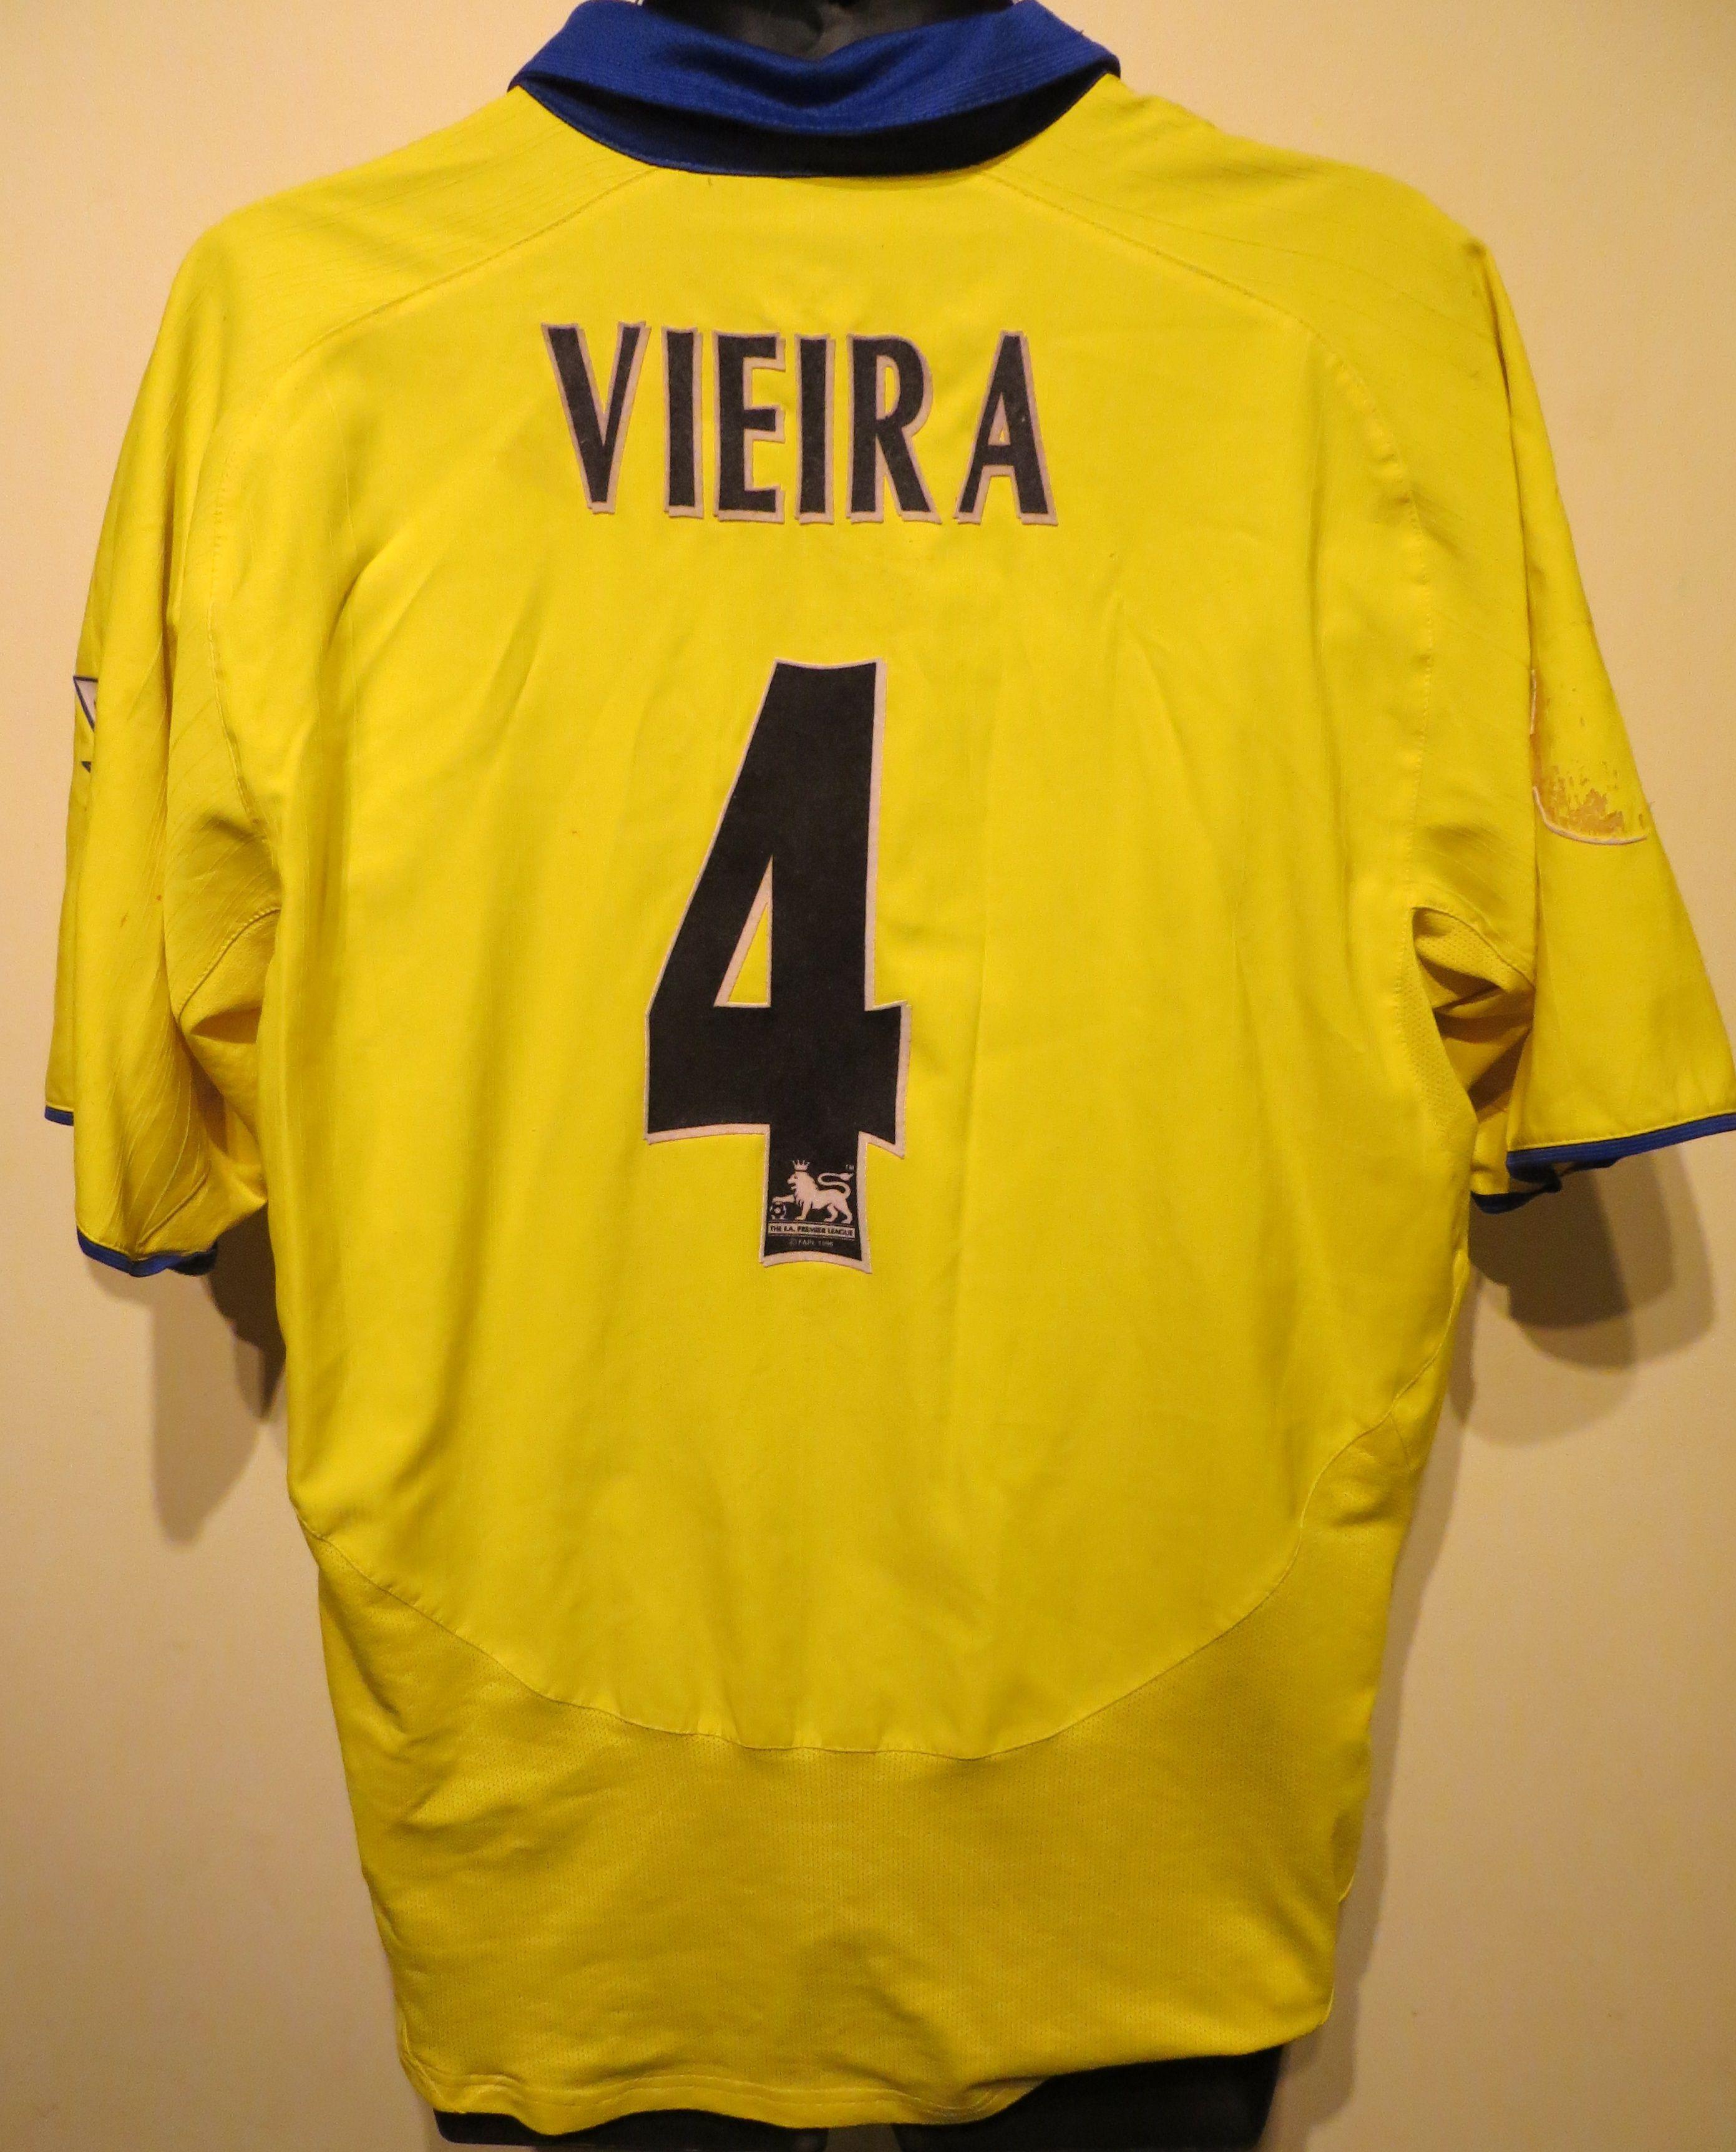 3ad8b692828 Patrick Vieira Arsenal away shirt by Nike